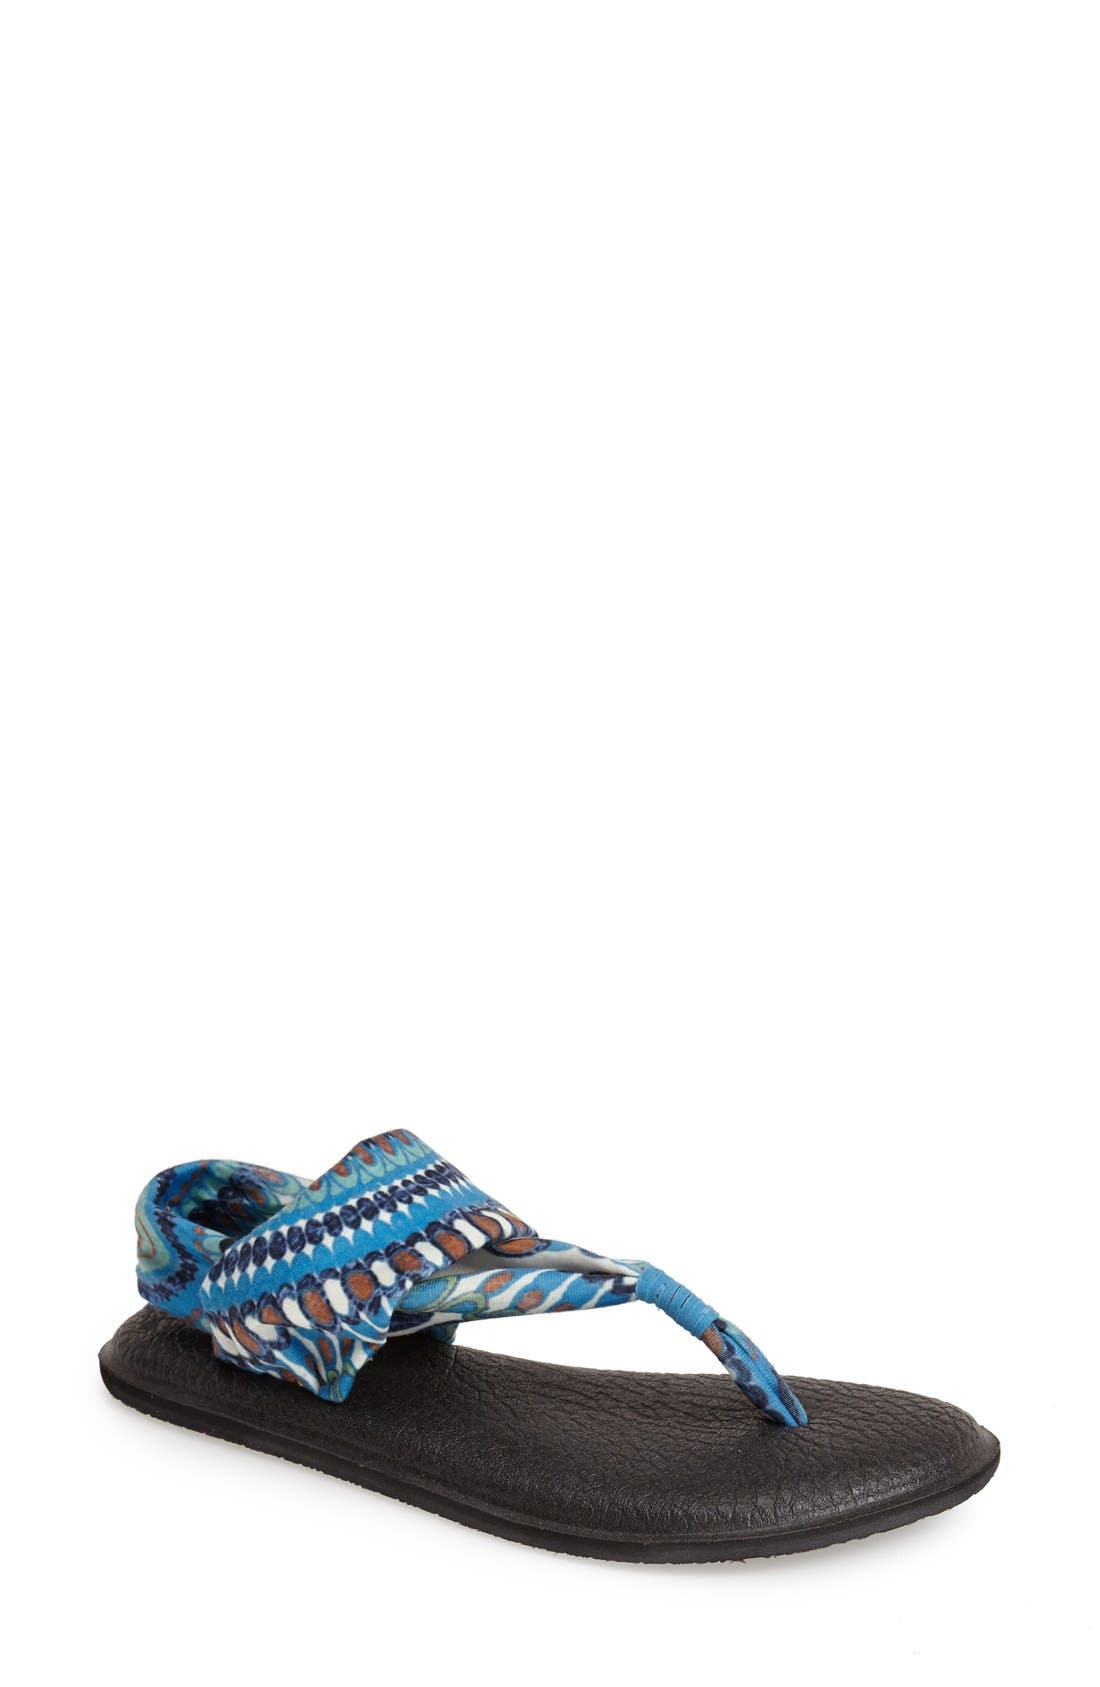 'Yoga Sling 2' Sandal,                             Main thumbnail 18, color,